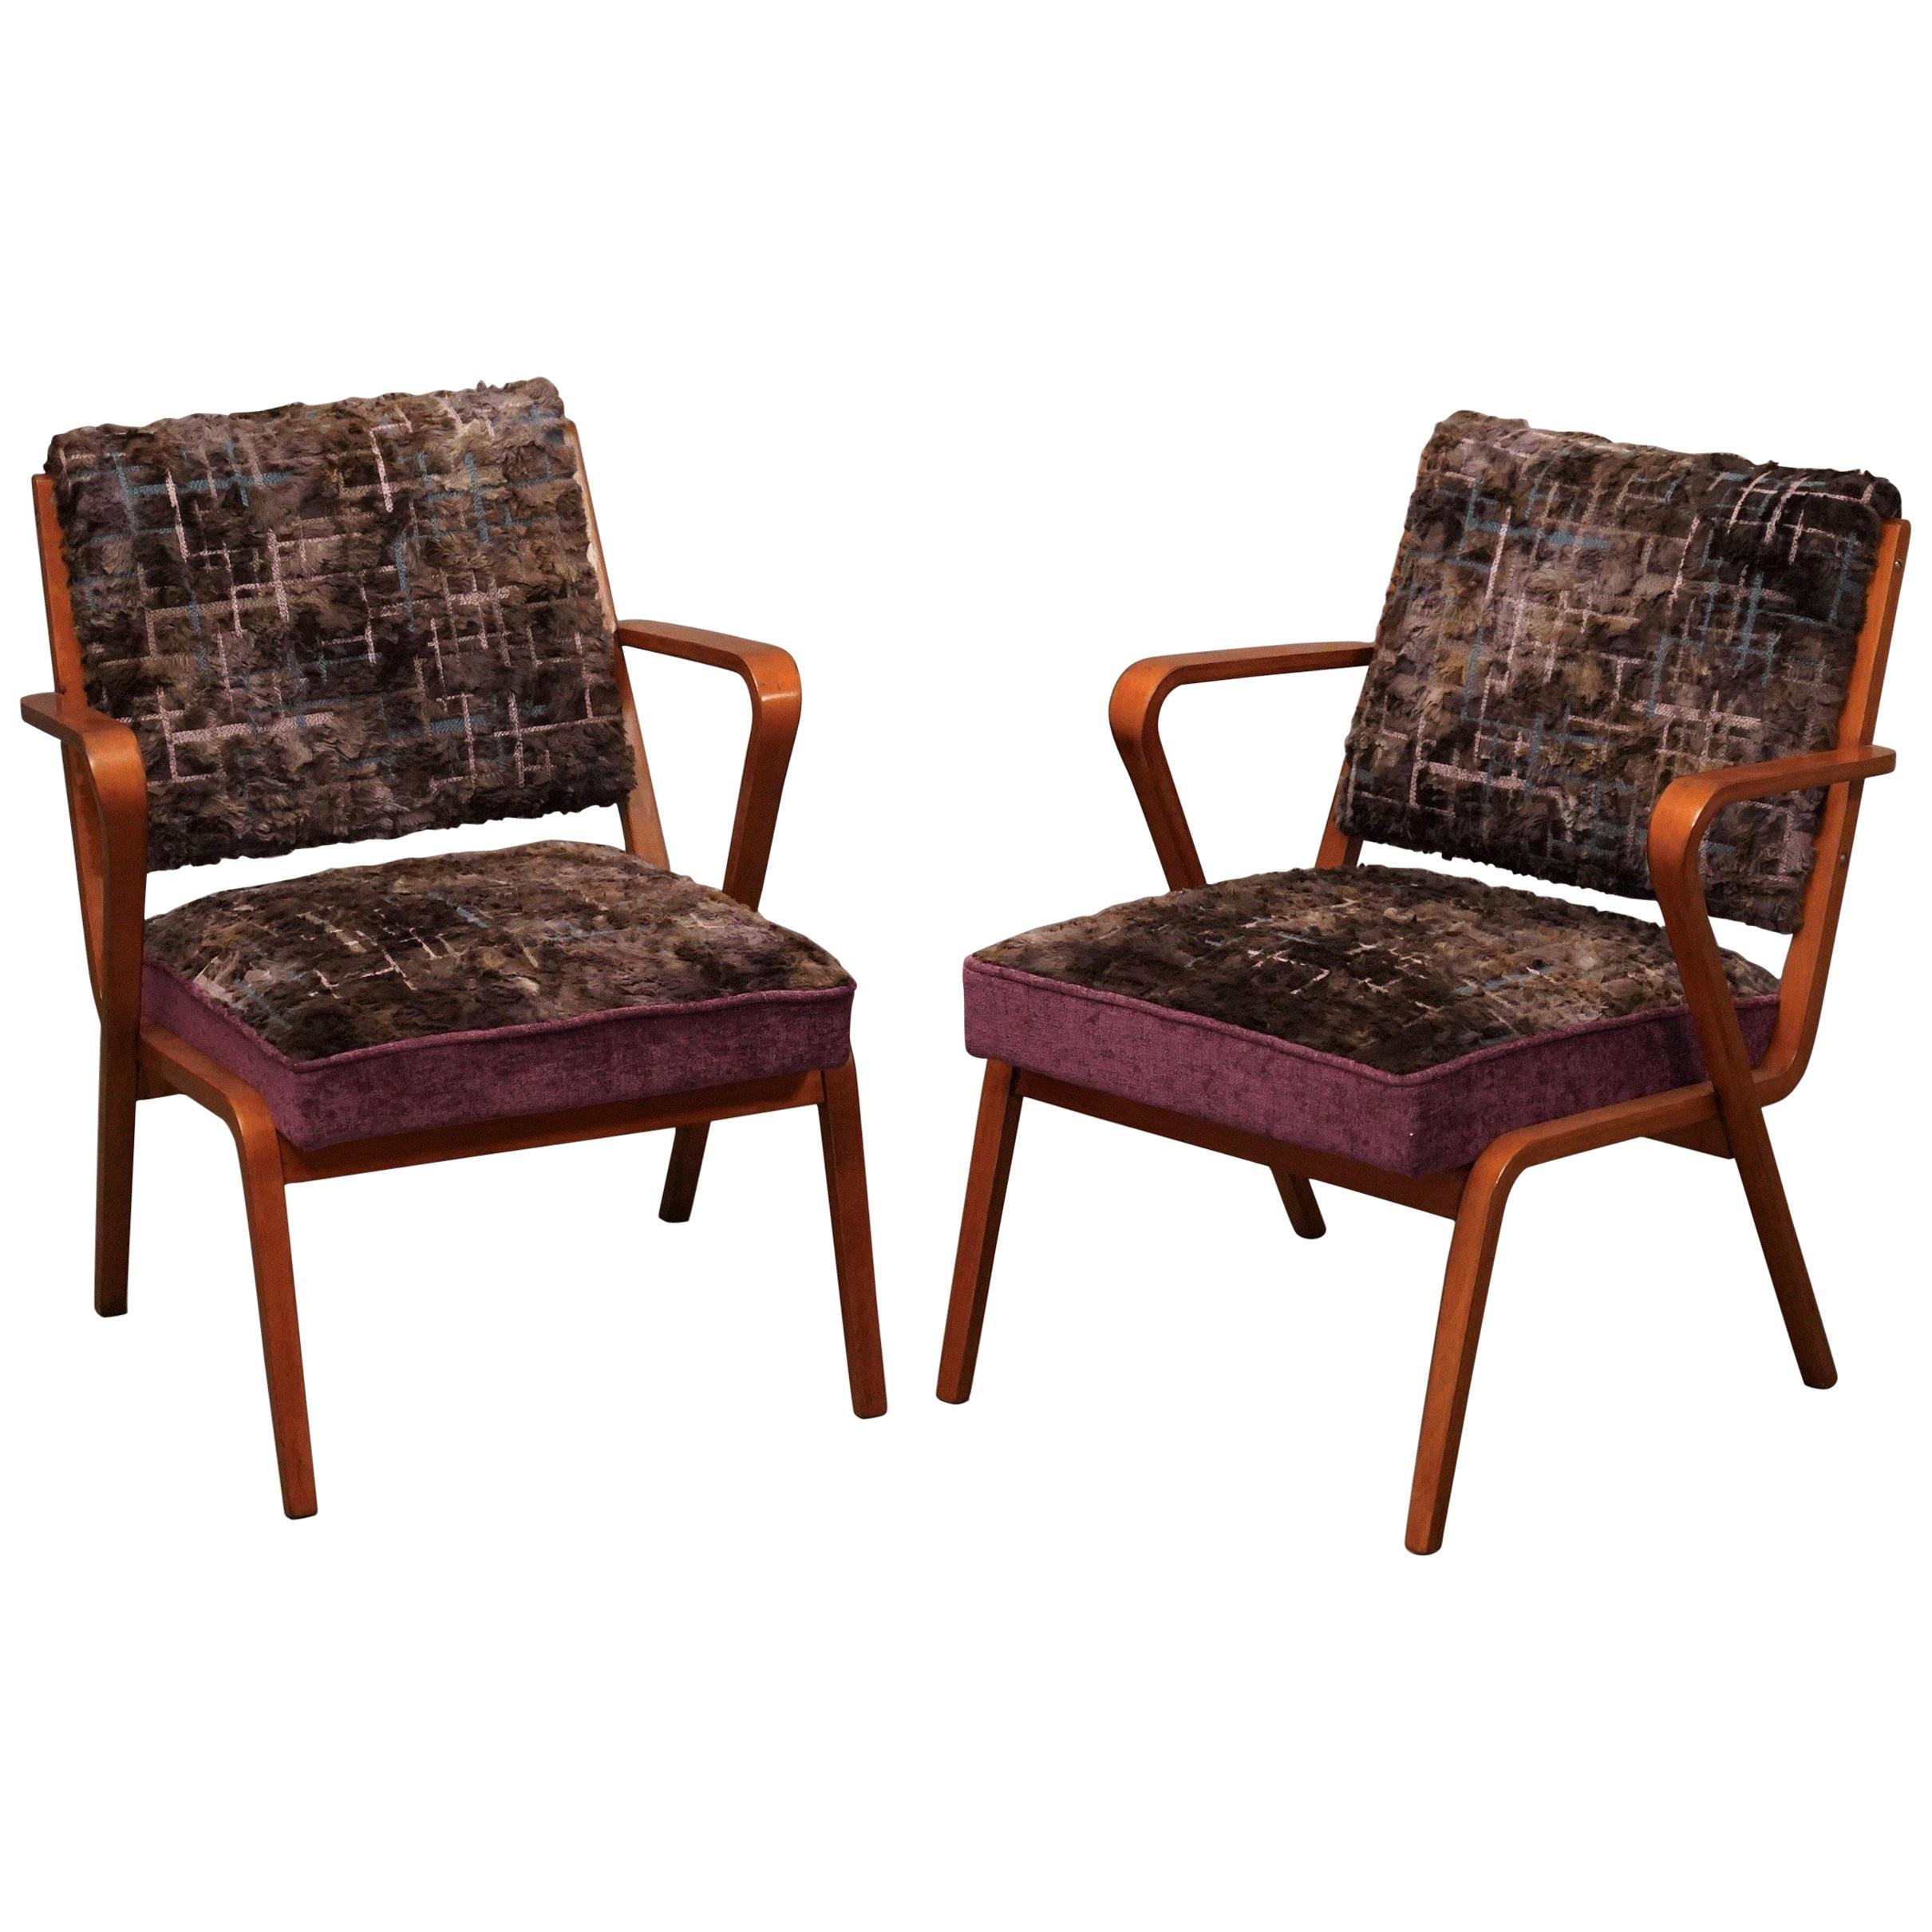 Pairs of Midcentury Violet Velvet Italian Armchairs, 1950